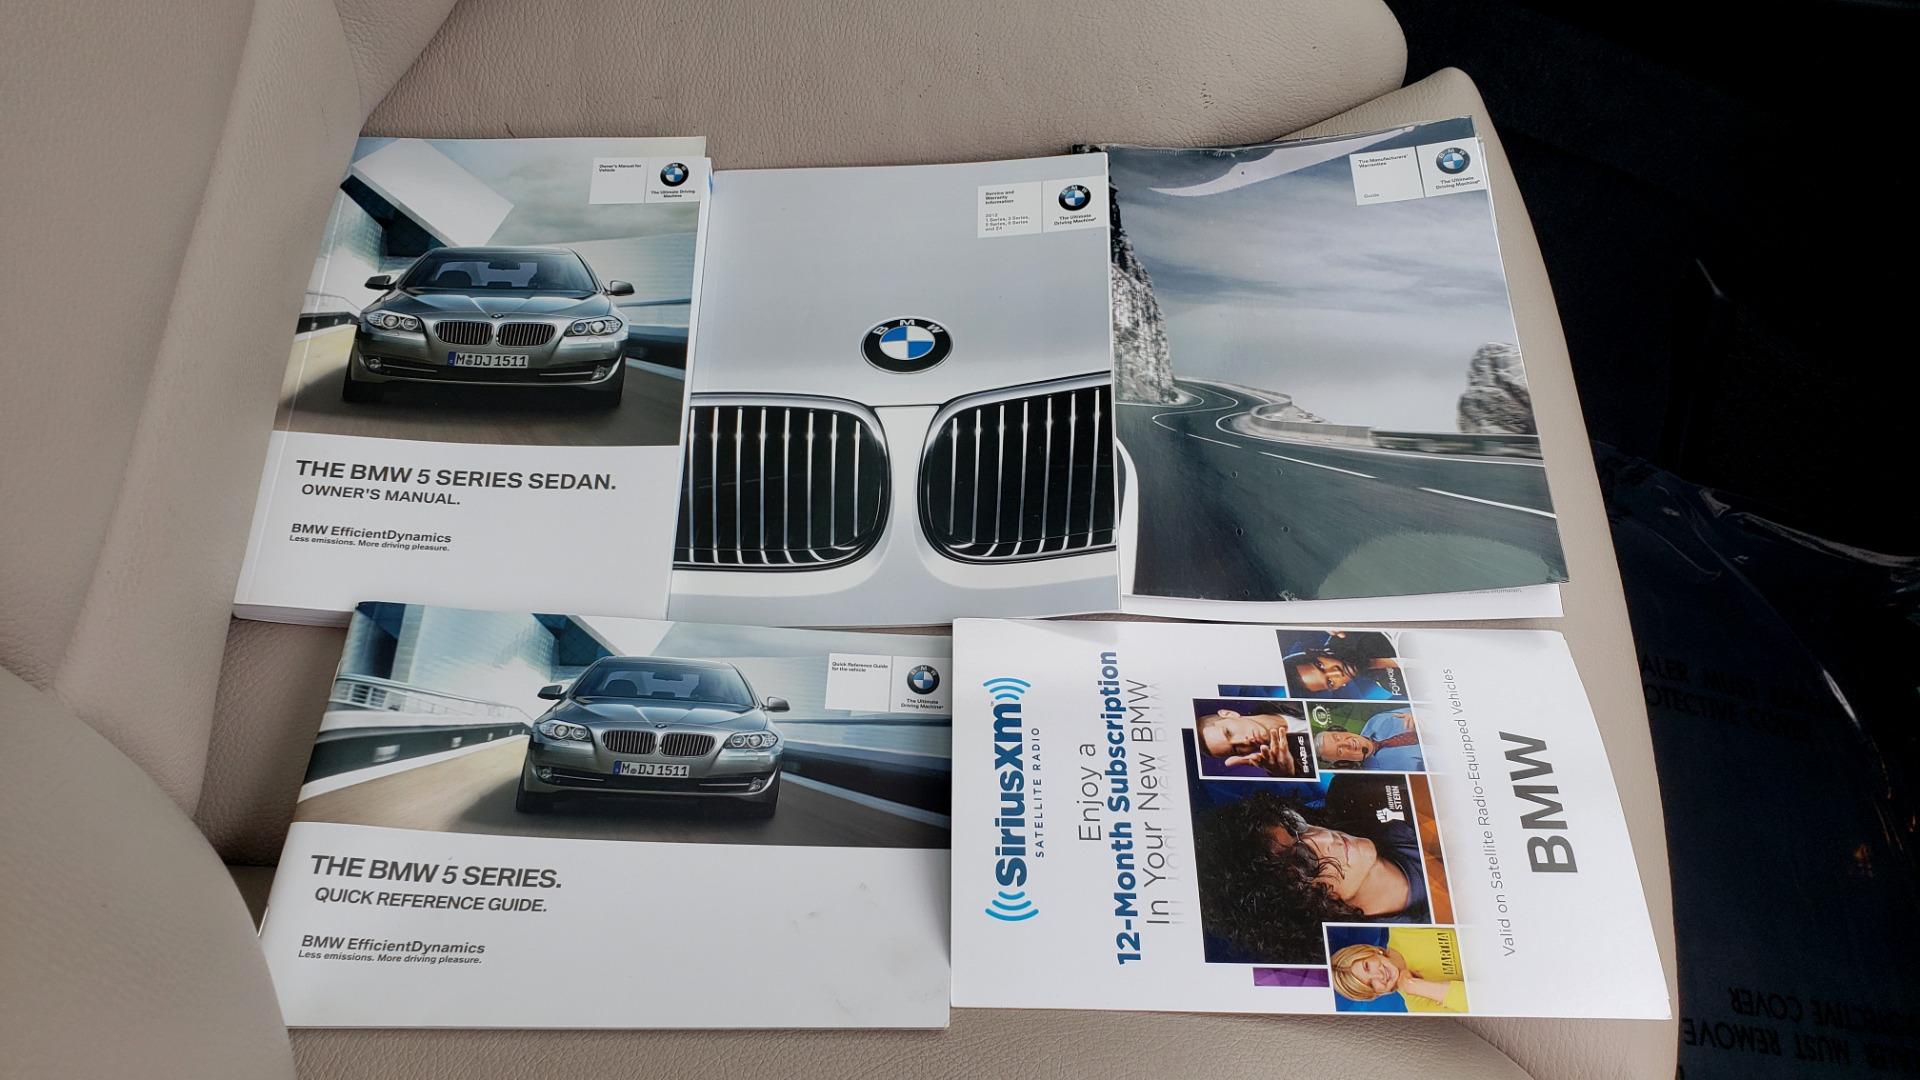 Used 2012 BMW 5 SERIES 550I M SPORT / NAV / CONV PKG / SUNROOF / PREM SND / REARVIEW for sale Sold at Formula Imports in Charlotte NC 28227 68